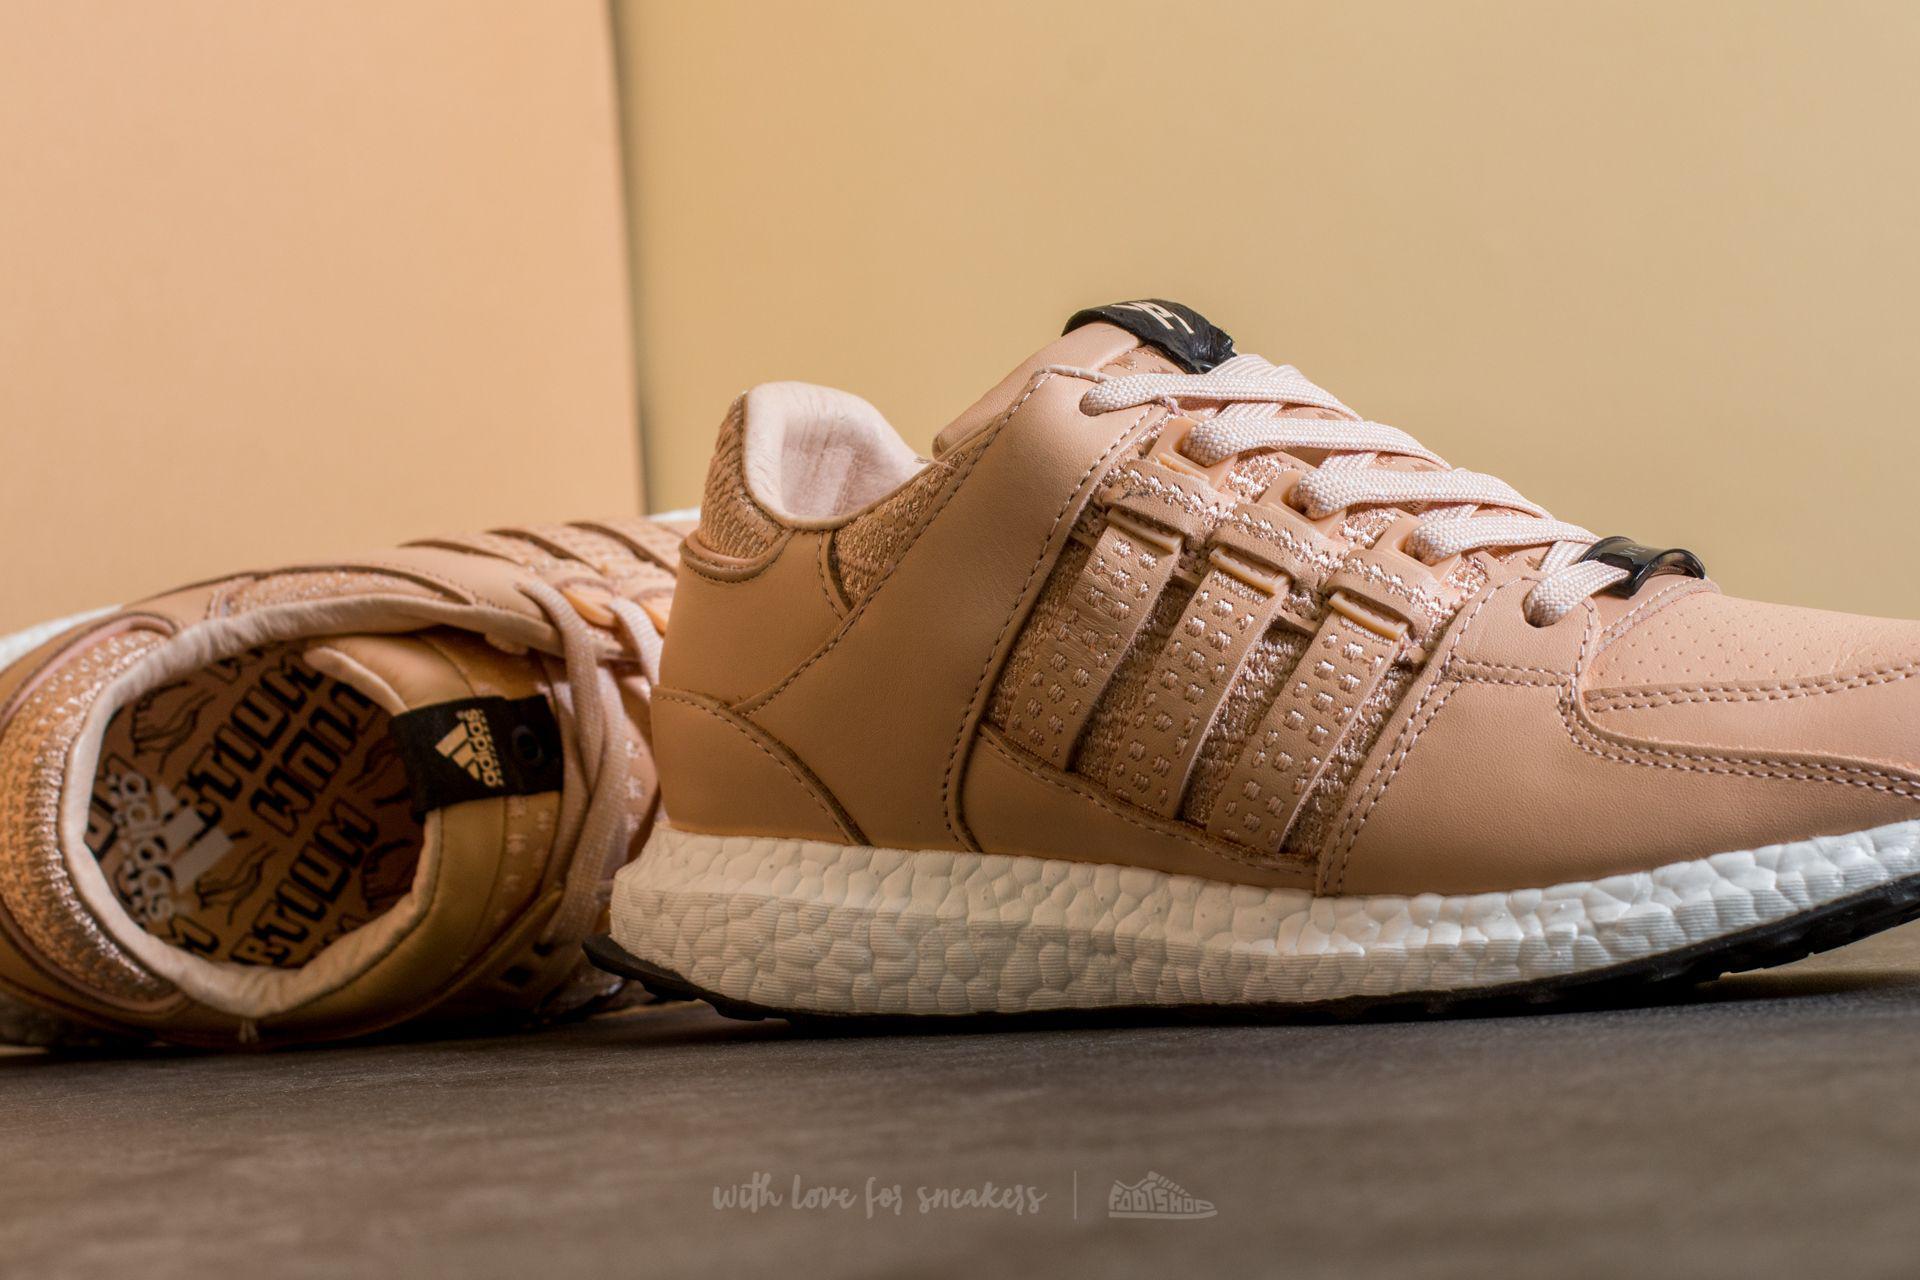 separation shoes c778a b8ad0 Lyst - adidas Originals Adidas X Consortium X Avenue Equipment ...